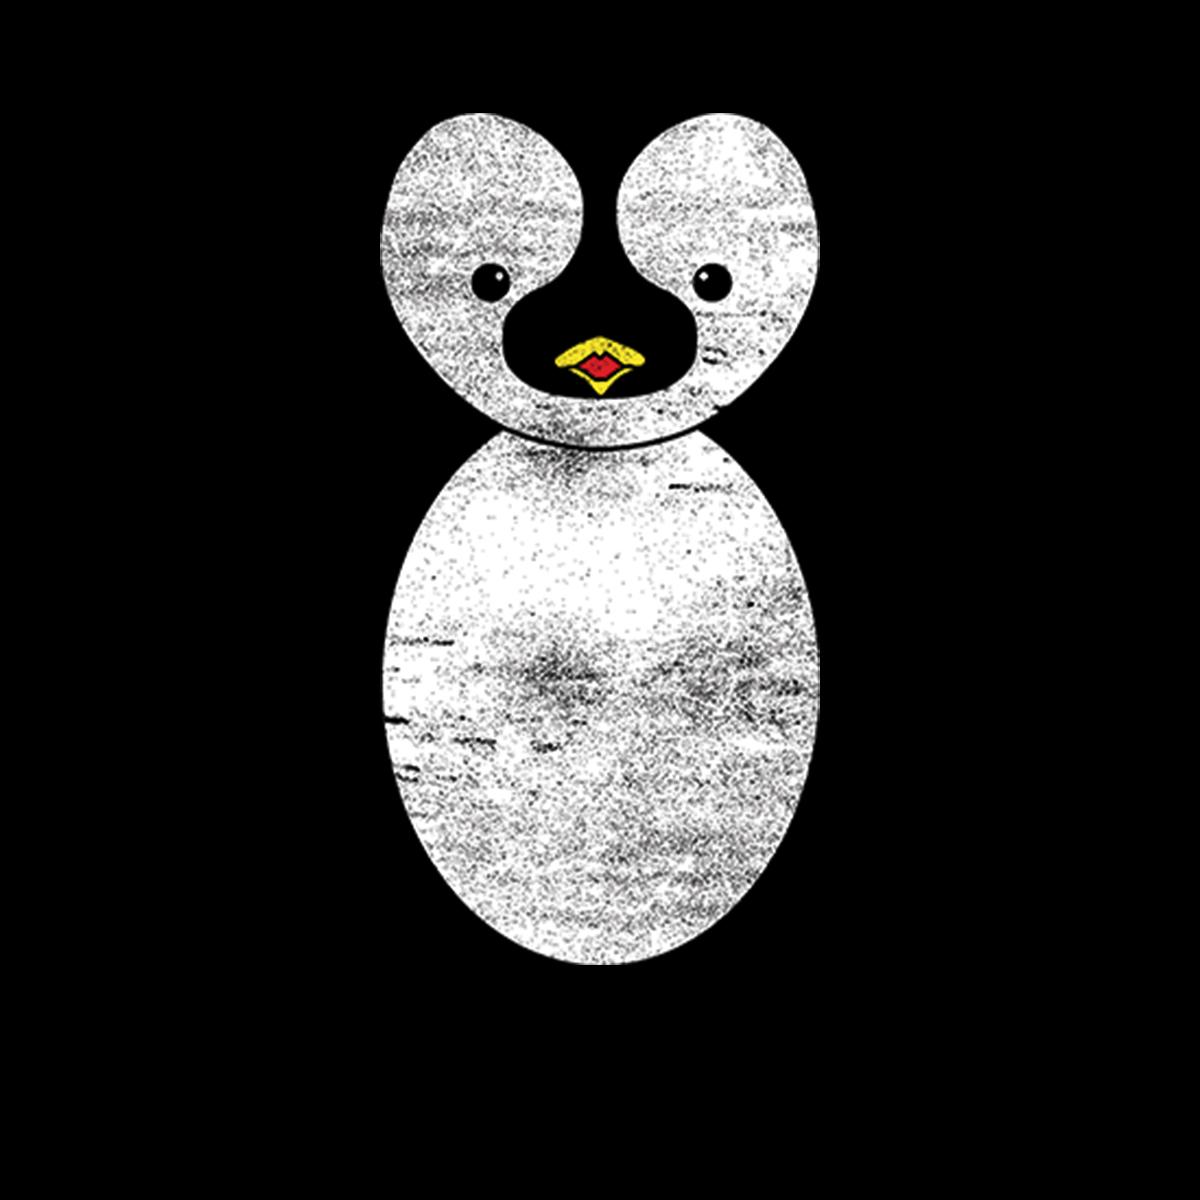 Pinguino-Antartide-La-Neve-Donna-T-shirt-XS-3XL